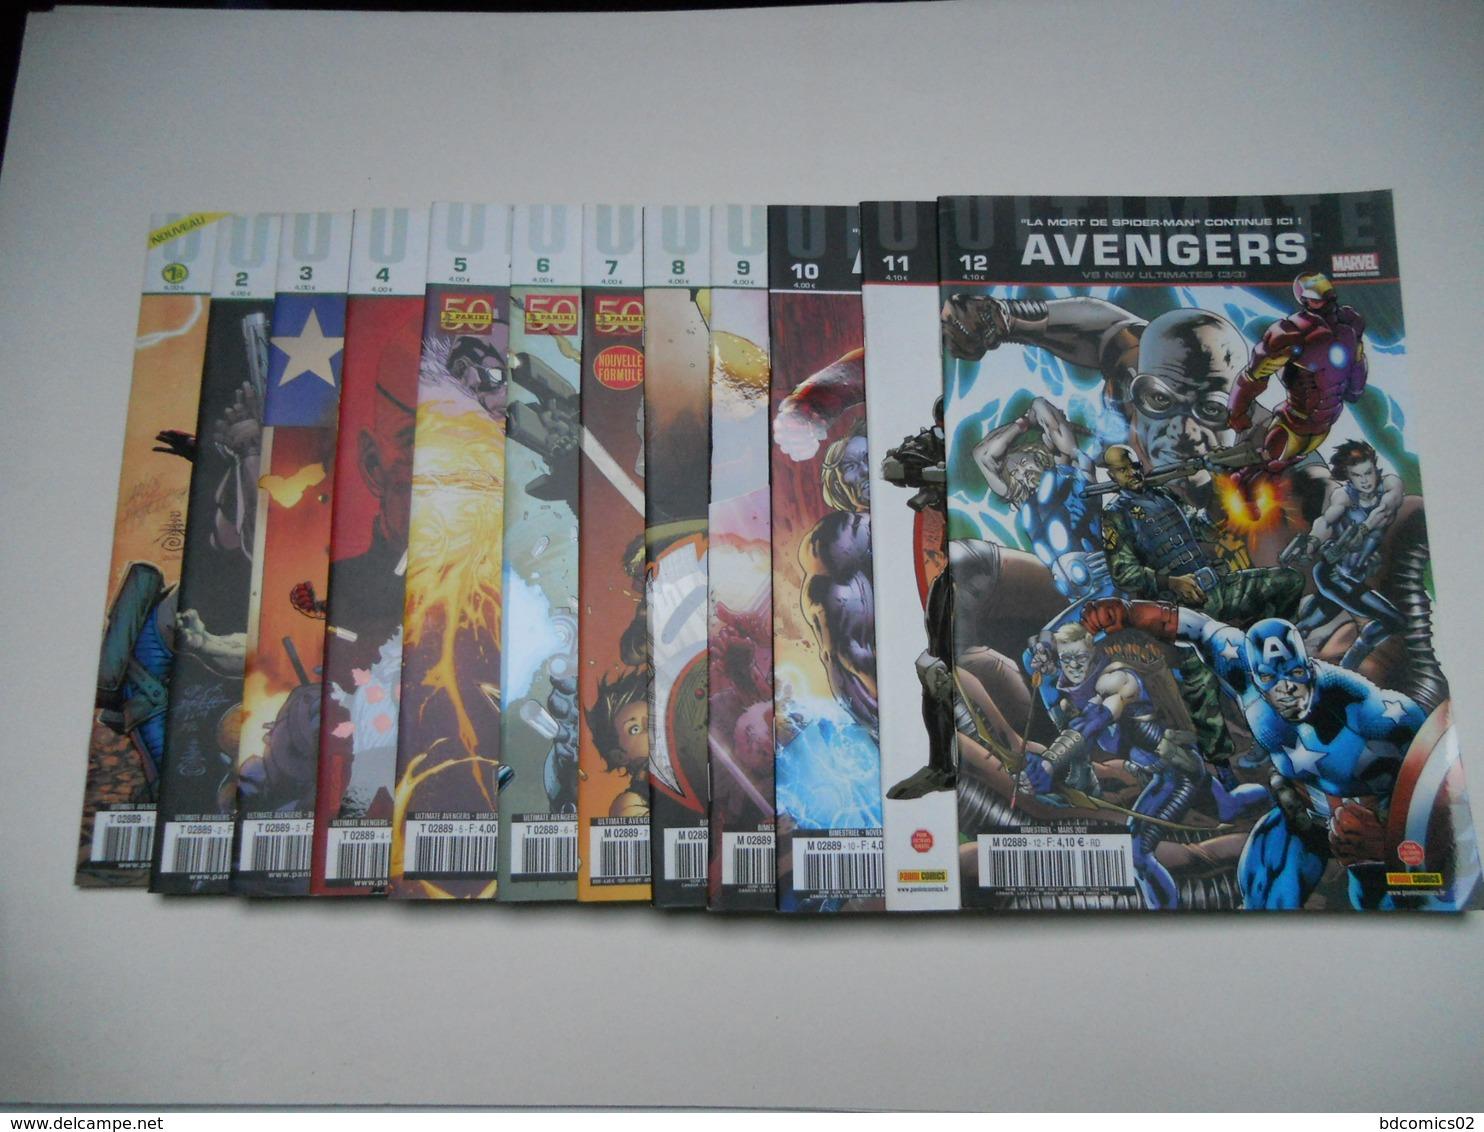 Avengers Ultimate Collection Complete Du N°1 Au N°12 Marvel Panini Comics Tbe - Books, Magazines, Comics